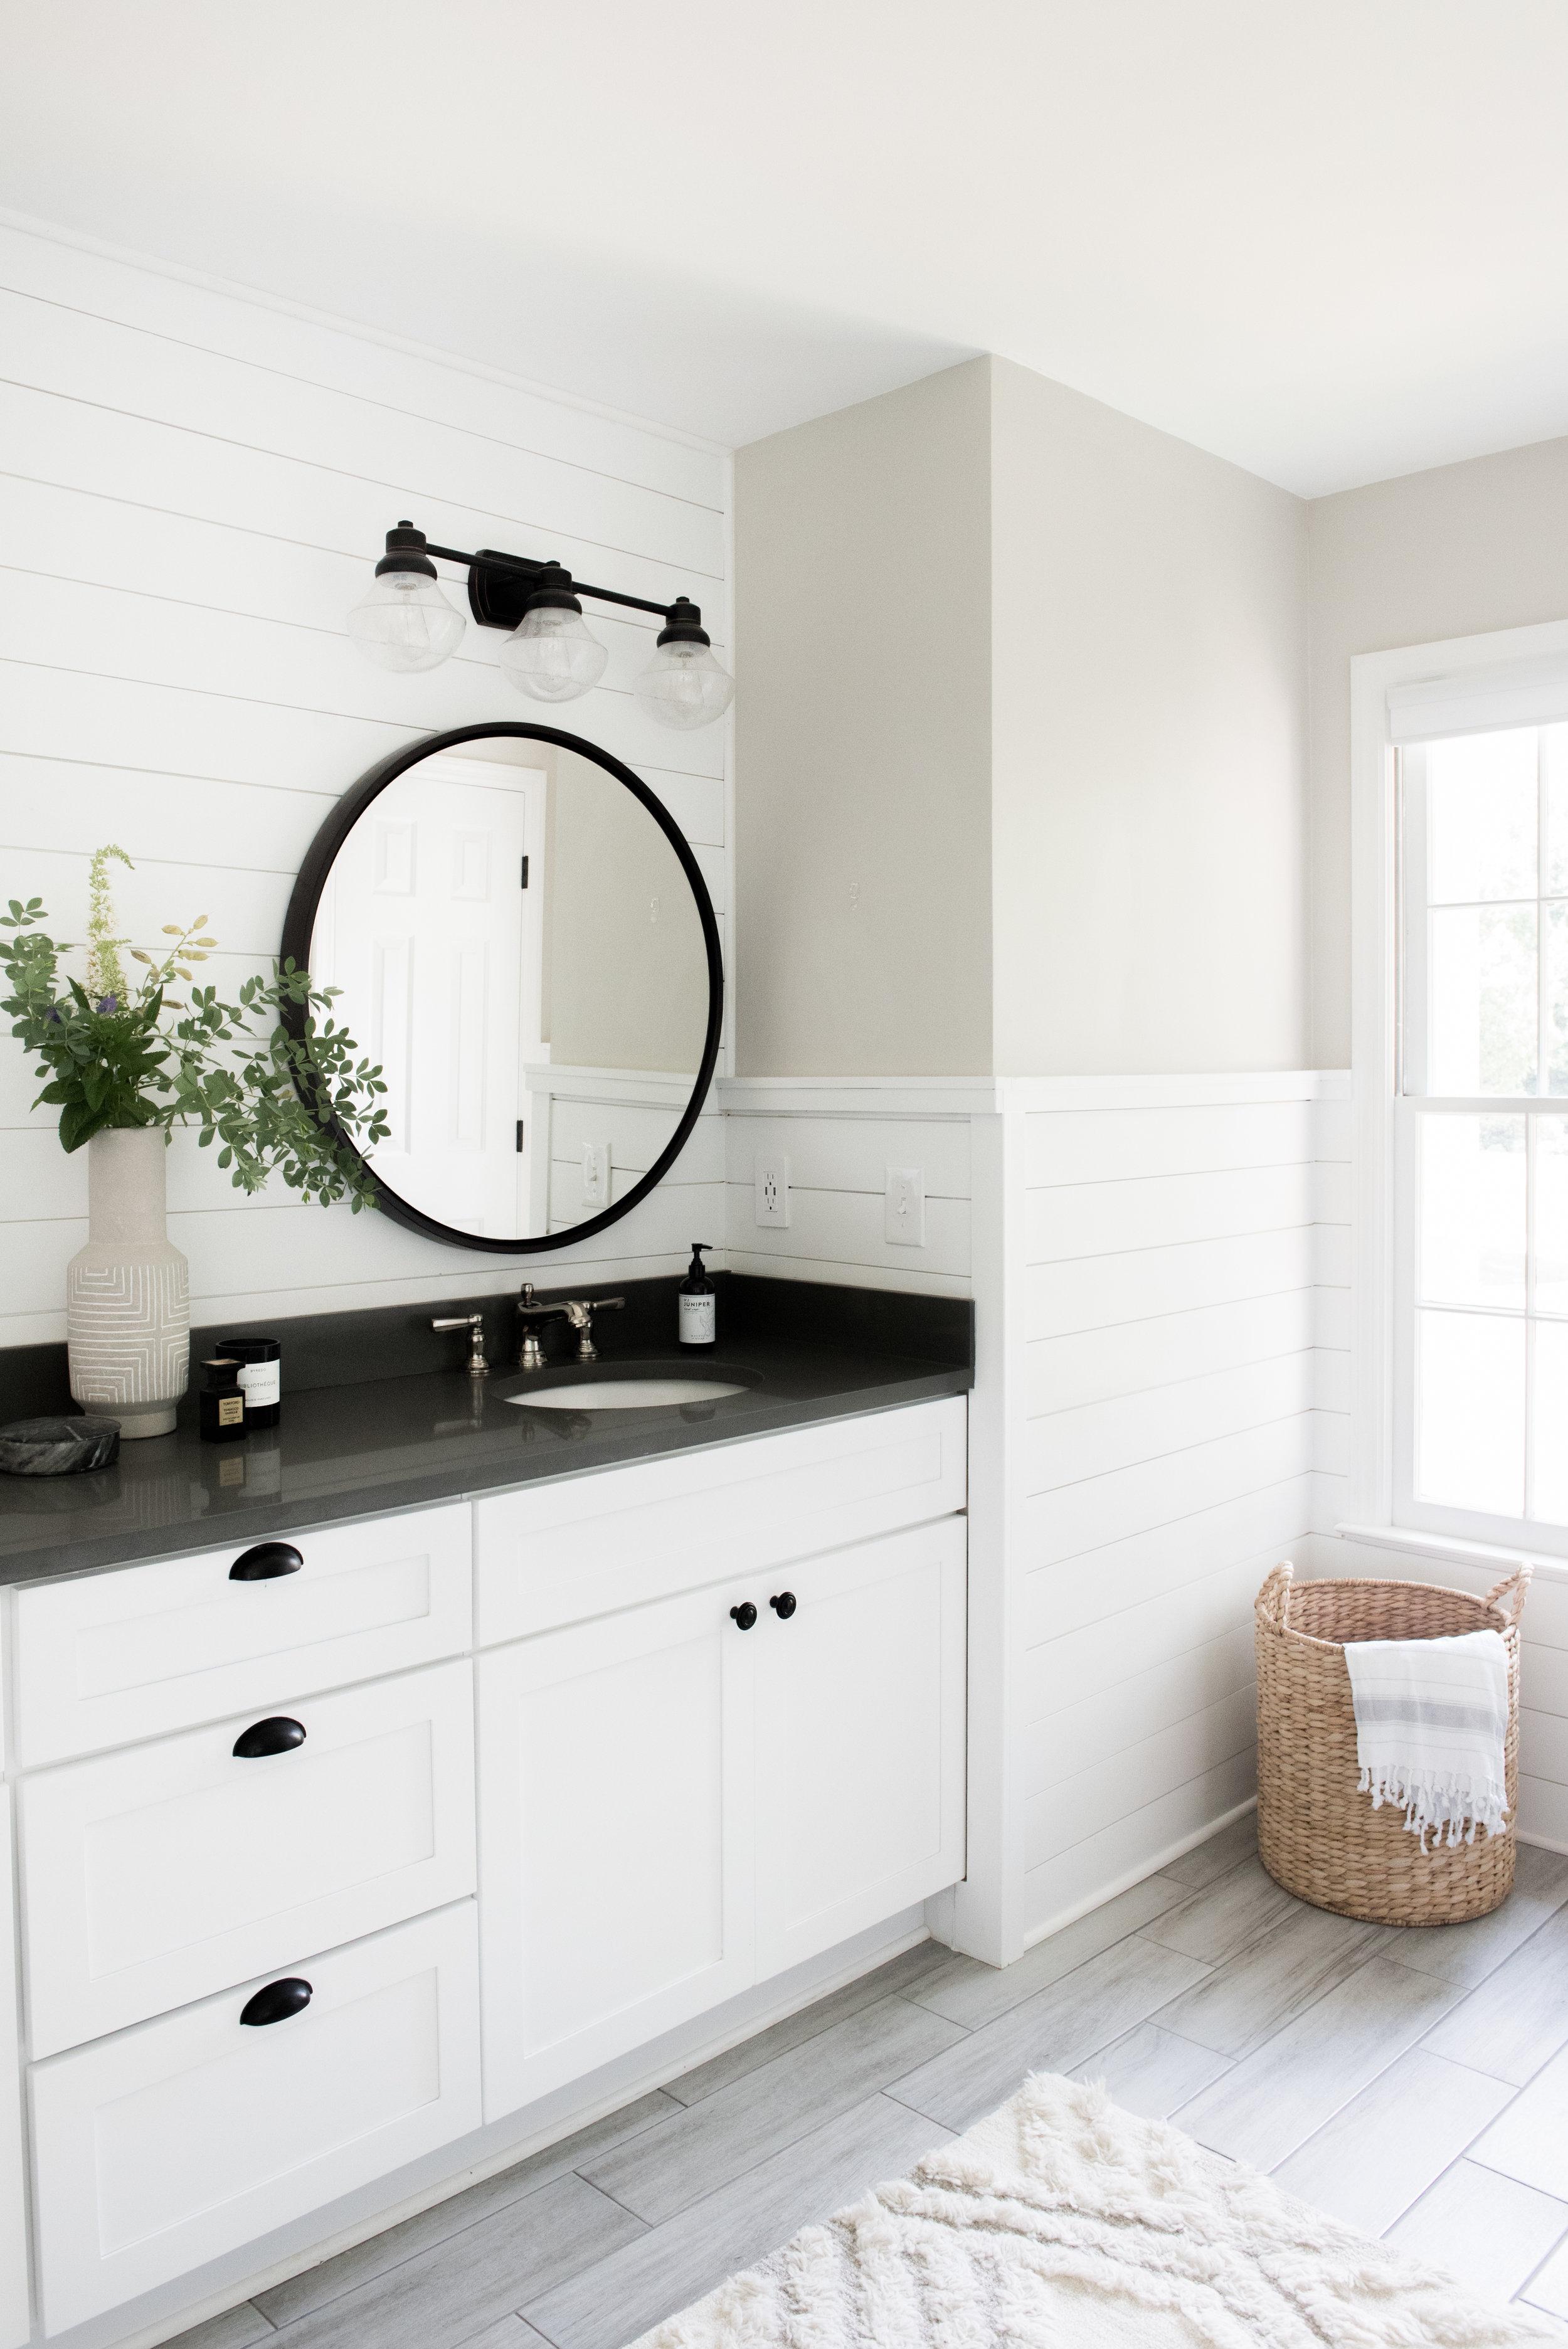 Modern Cozy Farmhouse Master Bathroom Renovation Styling On A Budget House Of Valentina